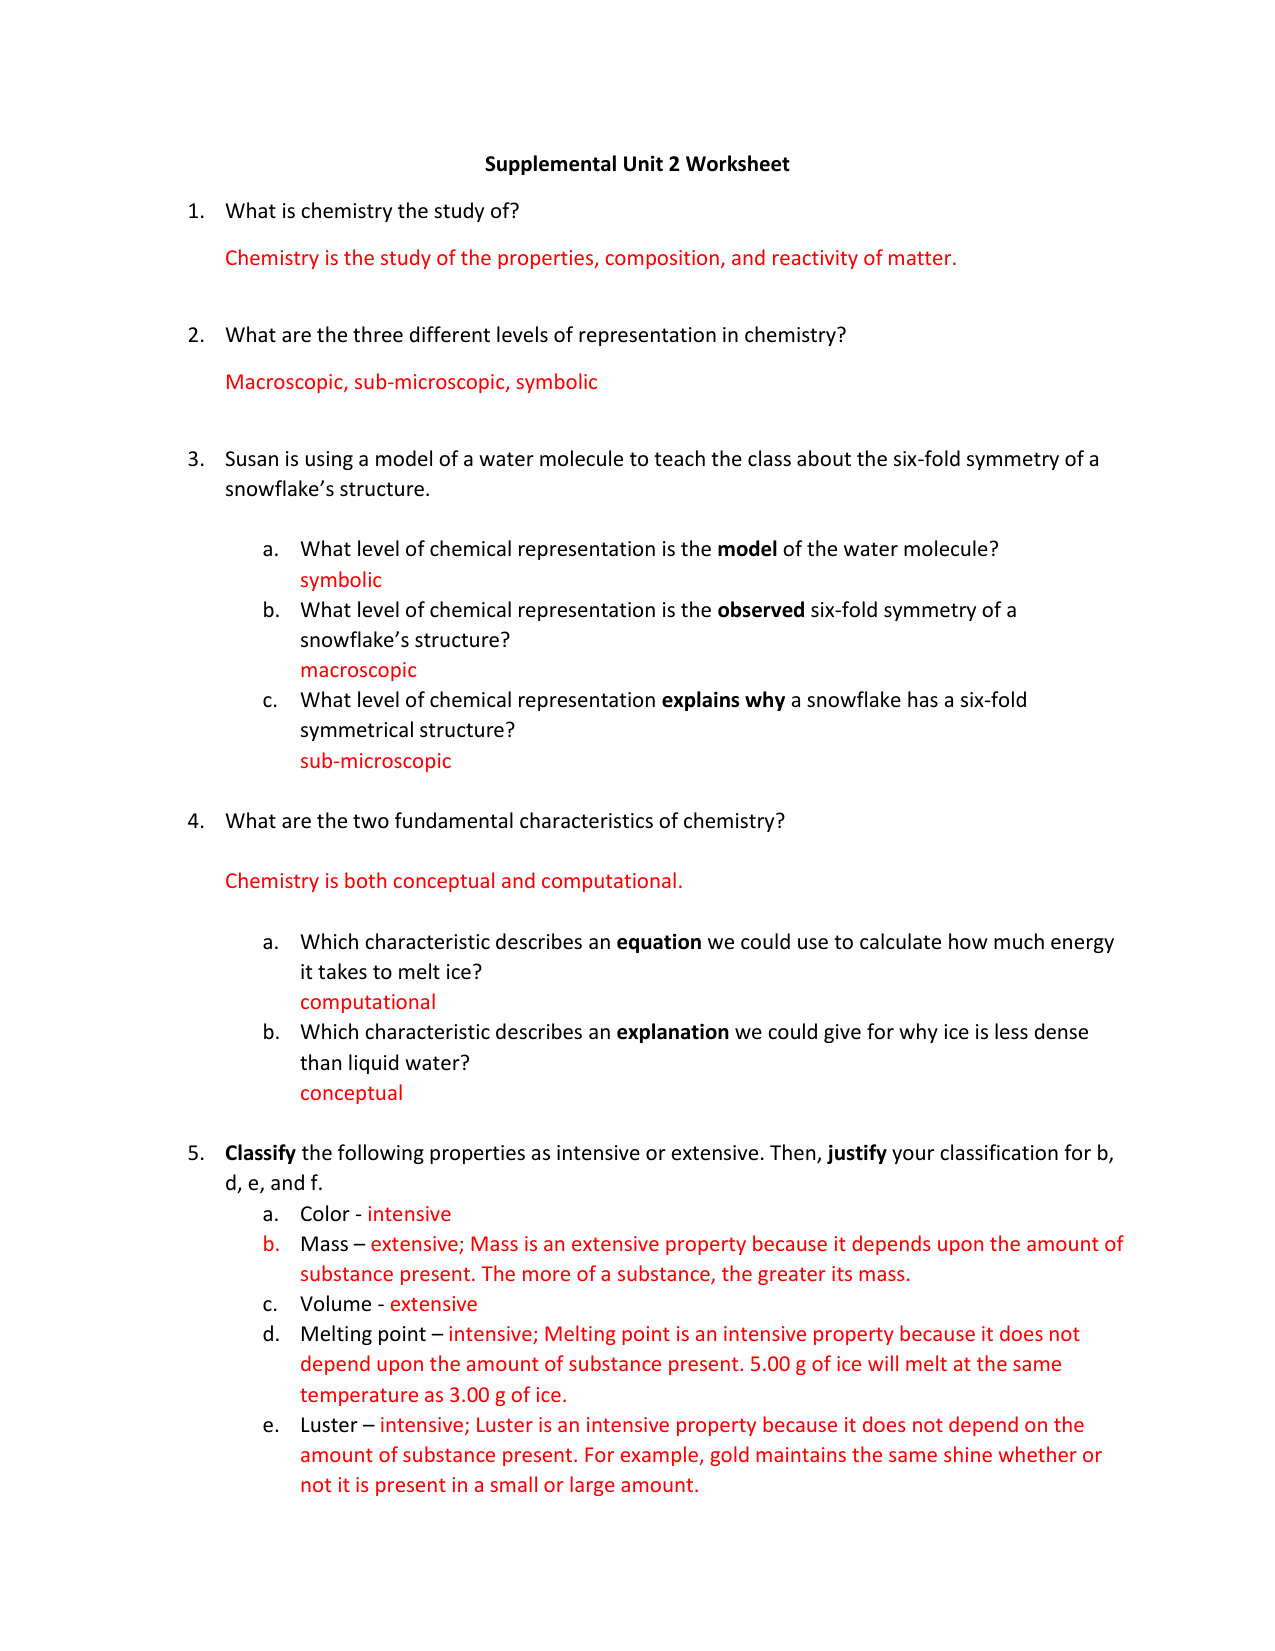 ANSWER KEY - Supplemental Unit 2 Worksheet